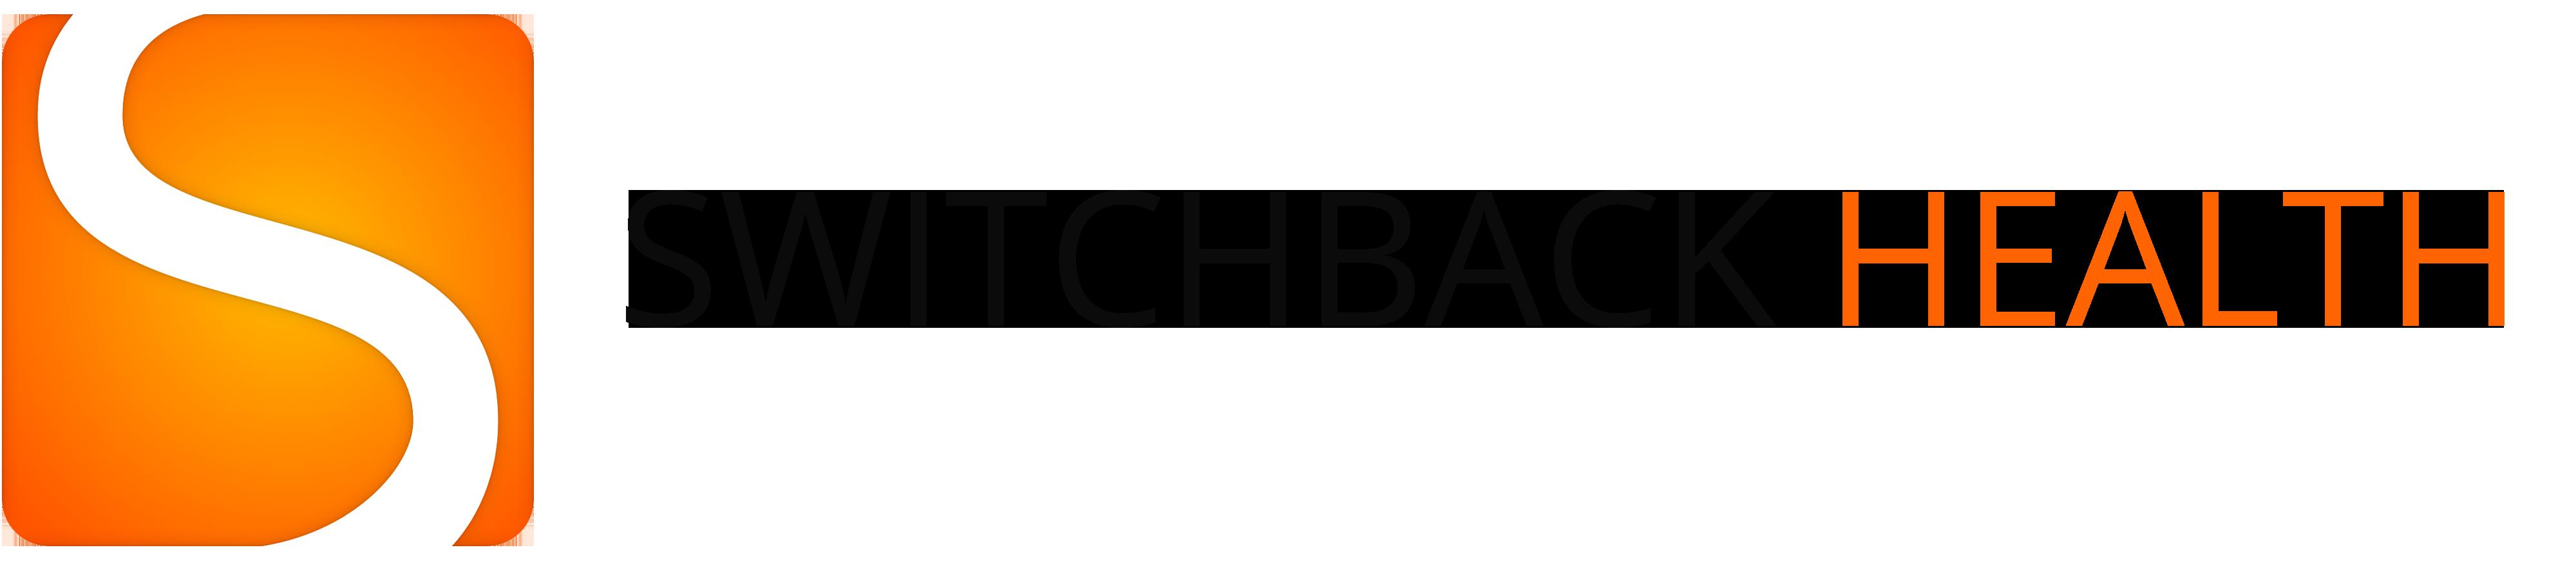 SwitchBack Health App